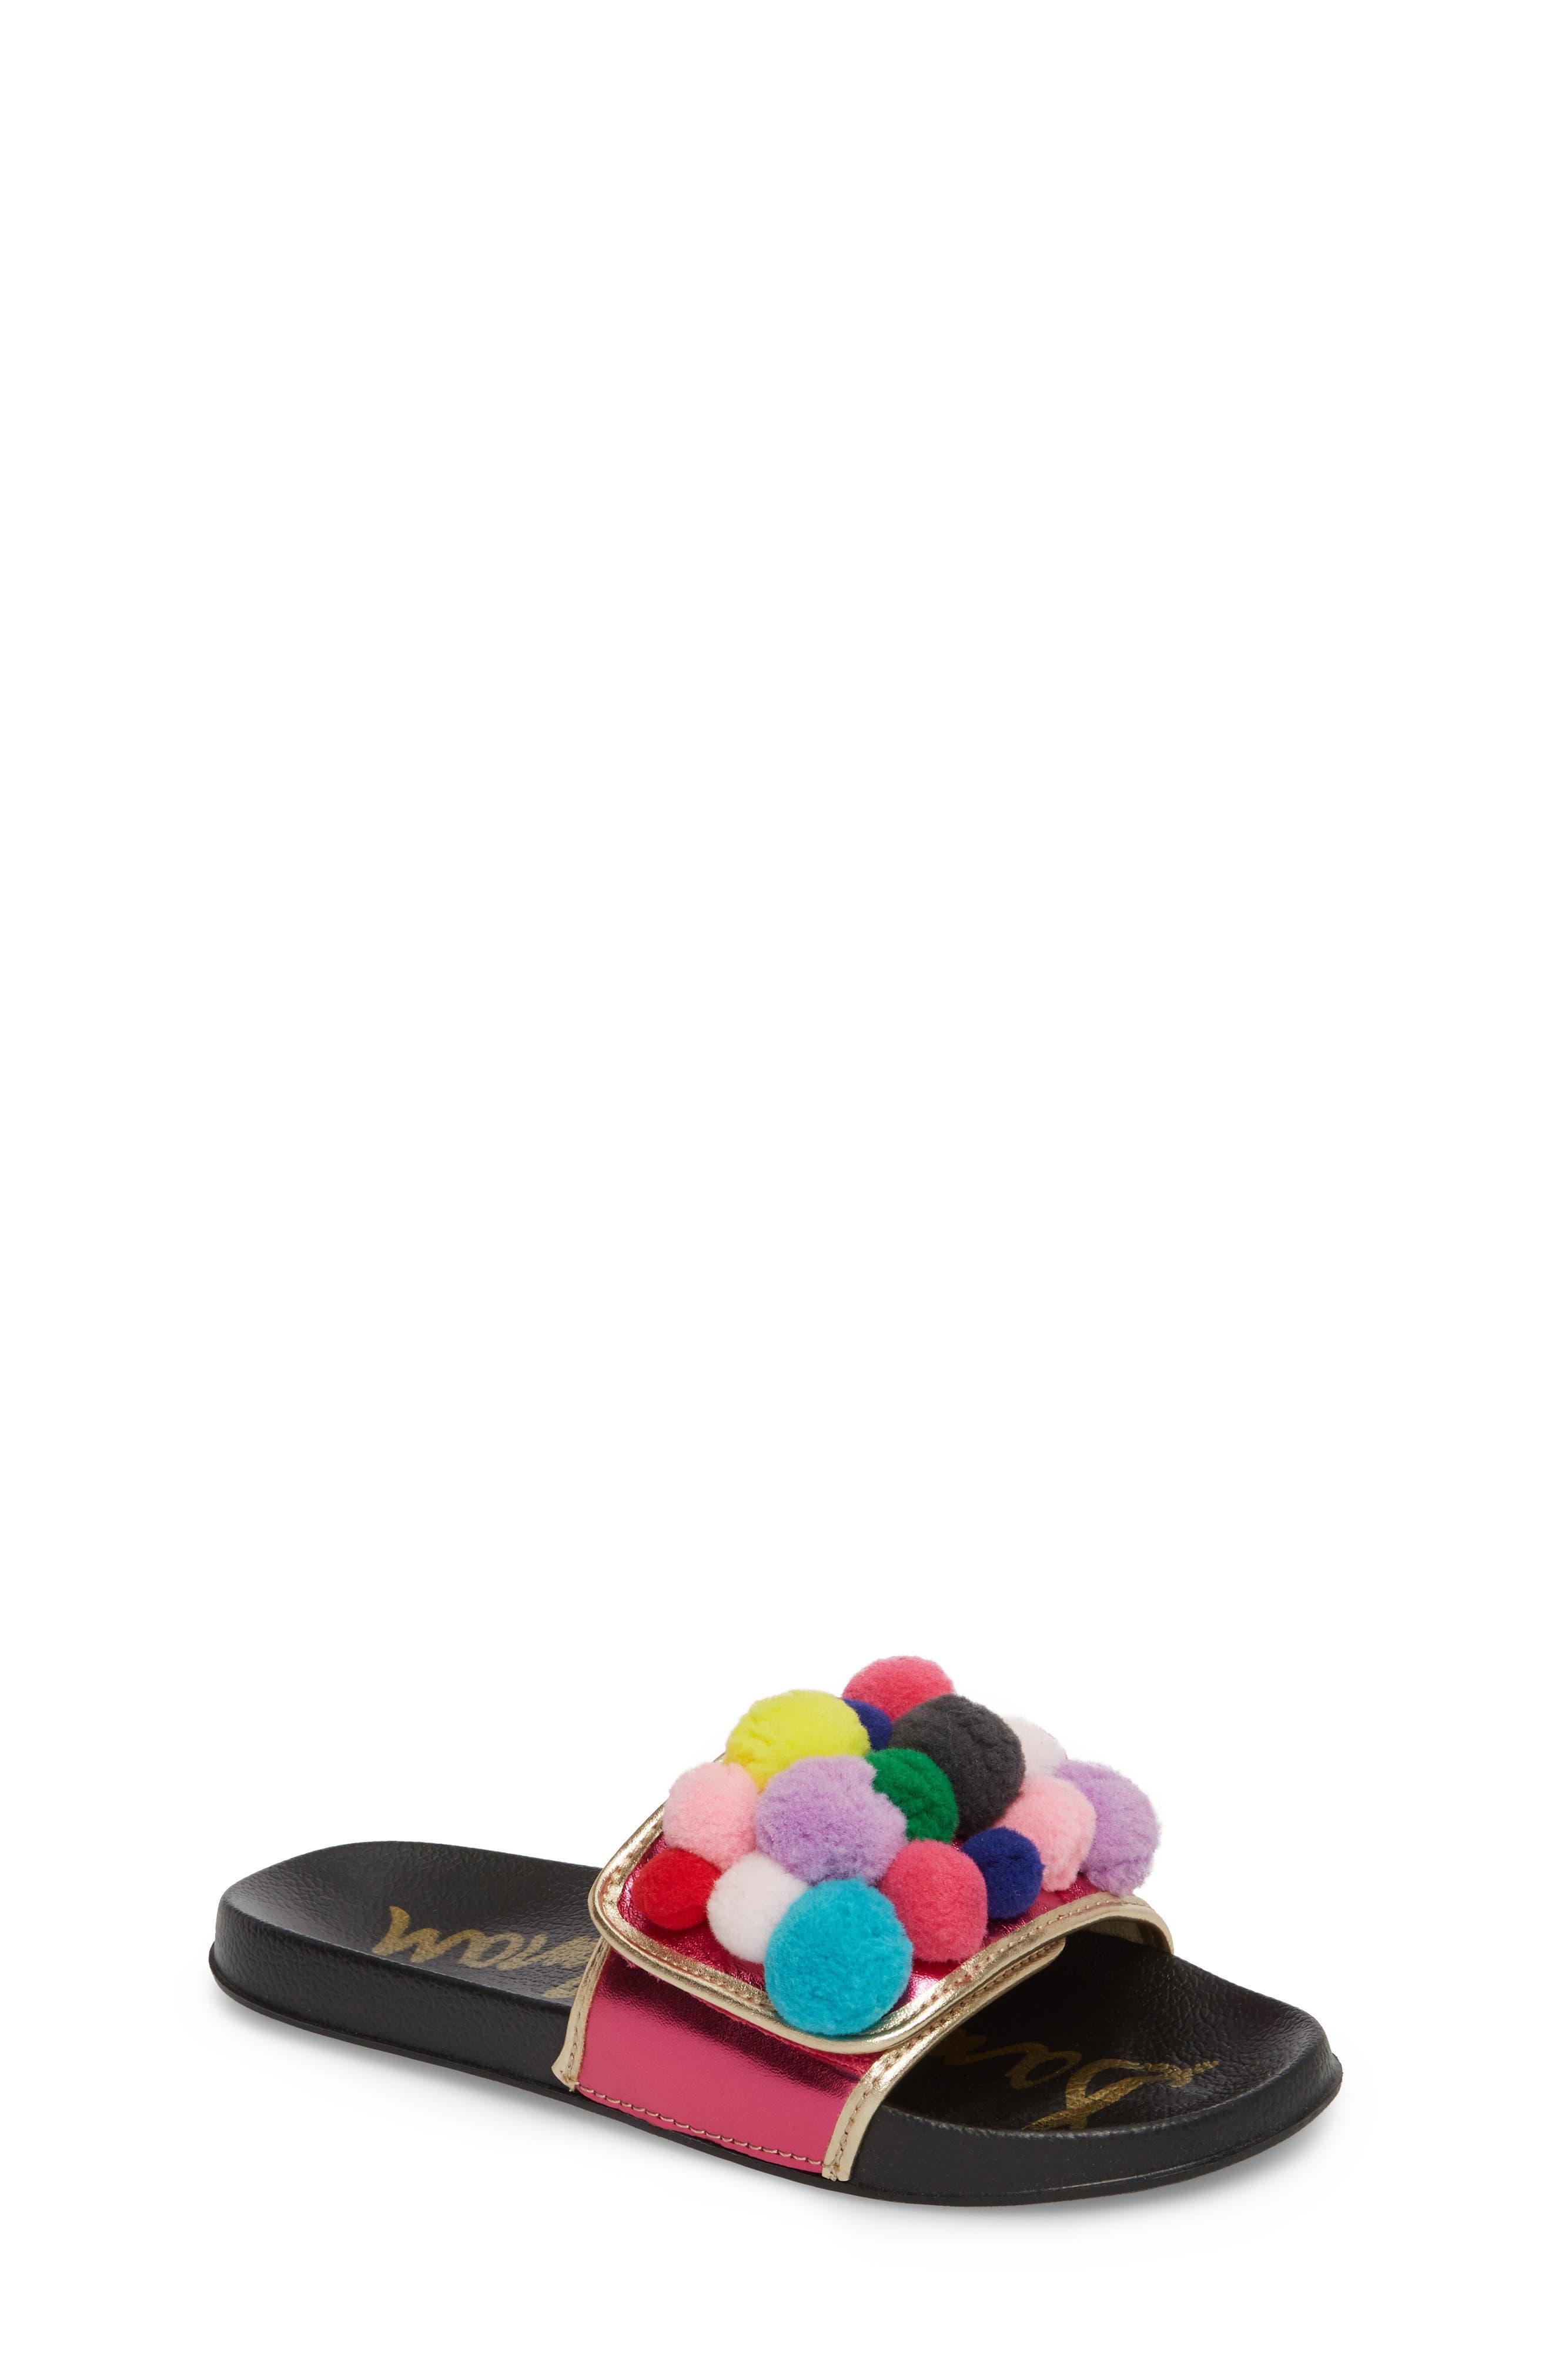 Faux Fur Mackie Cayman Sandal,                         Main,                         color, Hot Pink Multi